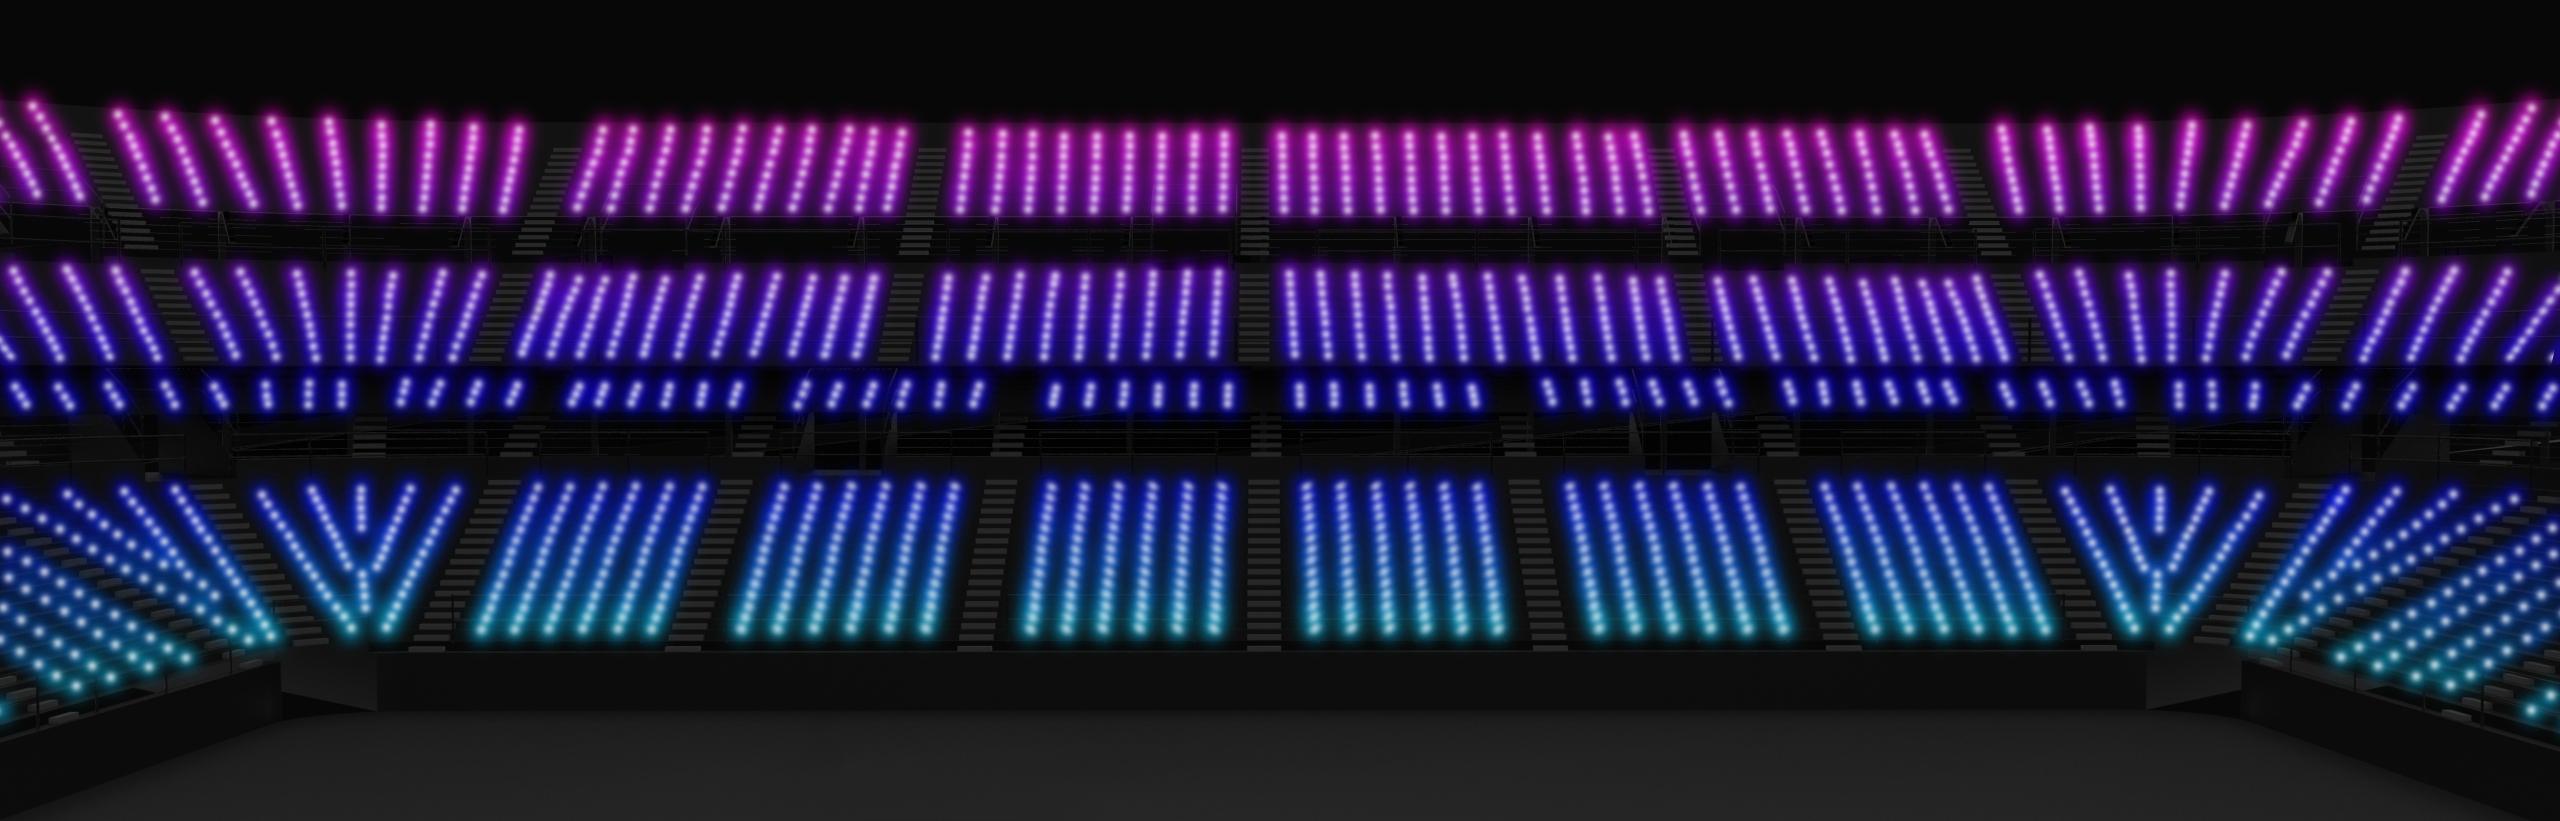 Copy-of-2021-01-07-Stadium-lights-blue-to-pink-gradient_crop